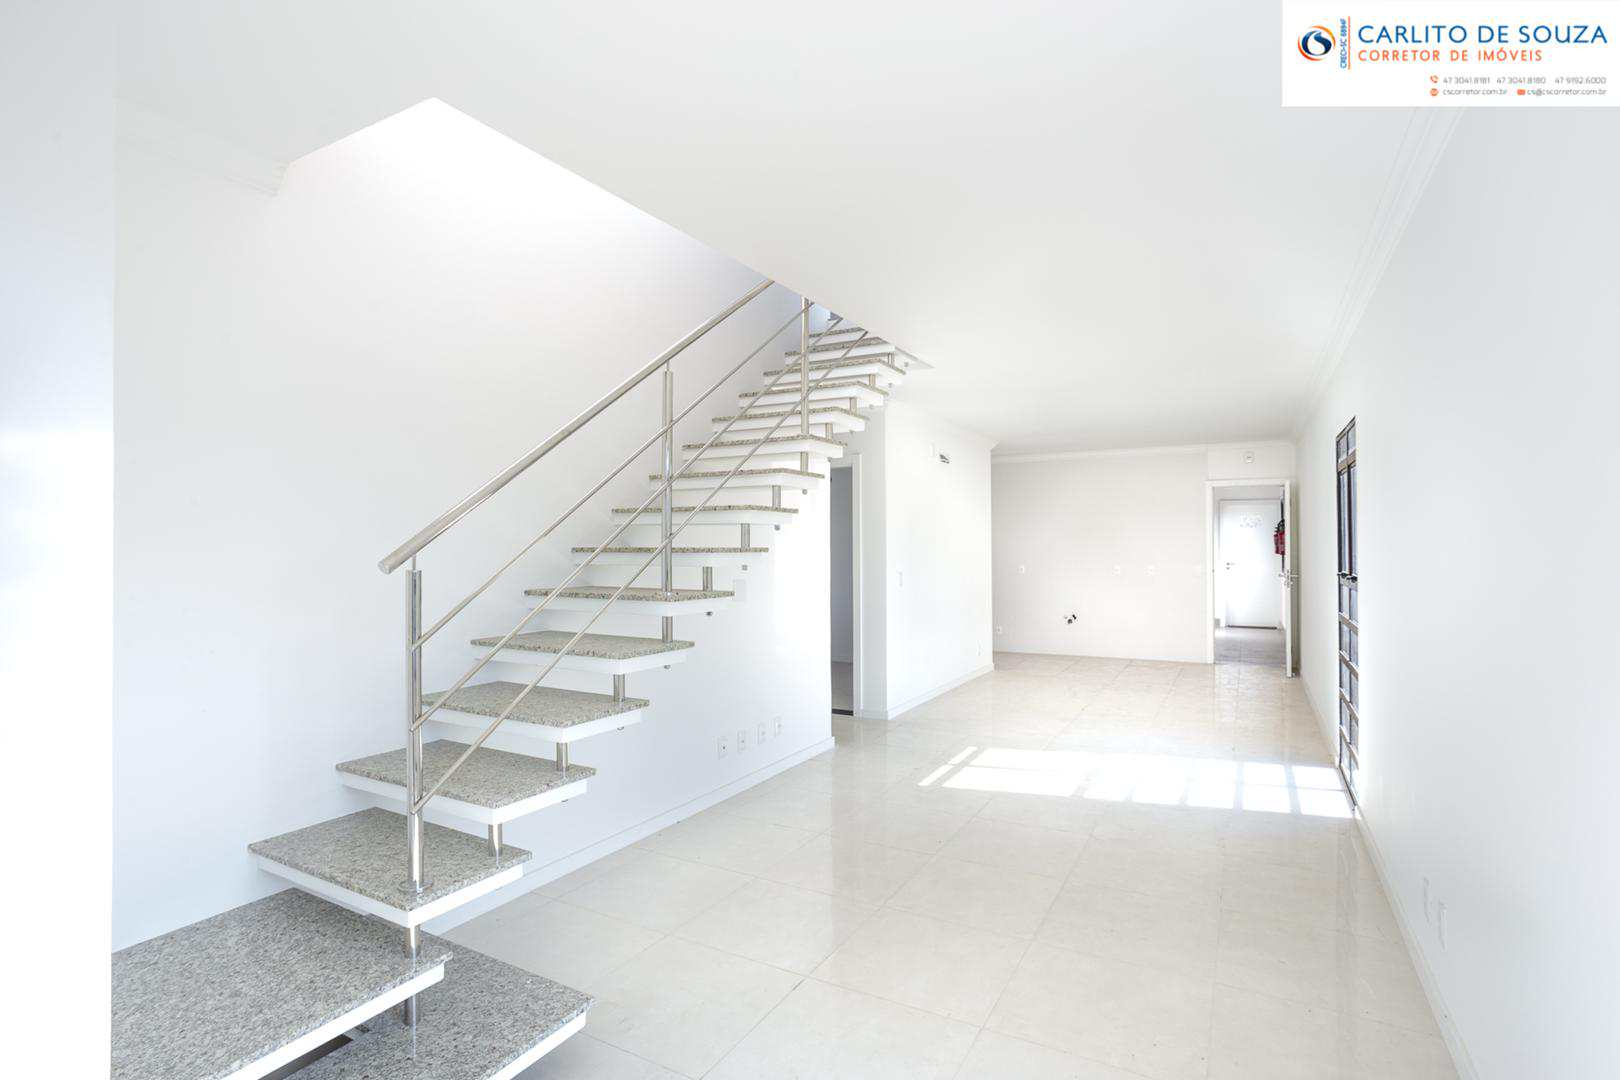 Cobertura com 3 dorm (1 suite), Garcia, Blumenau, Cod: 35